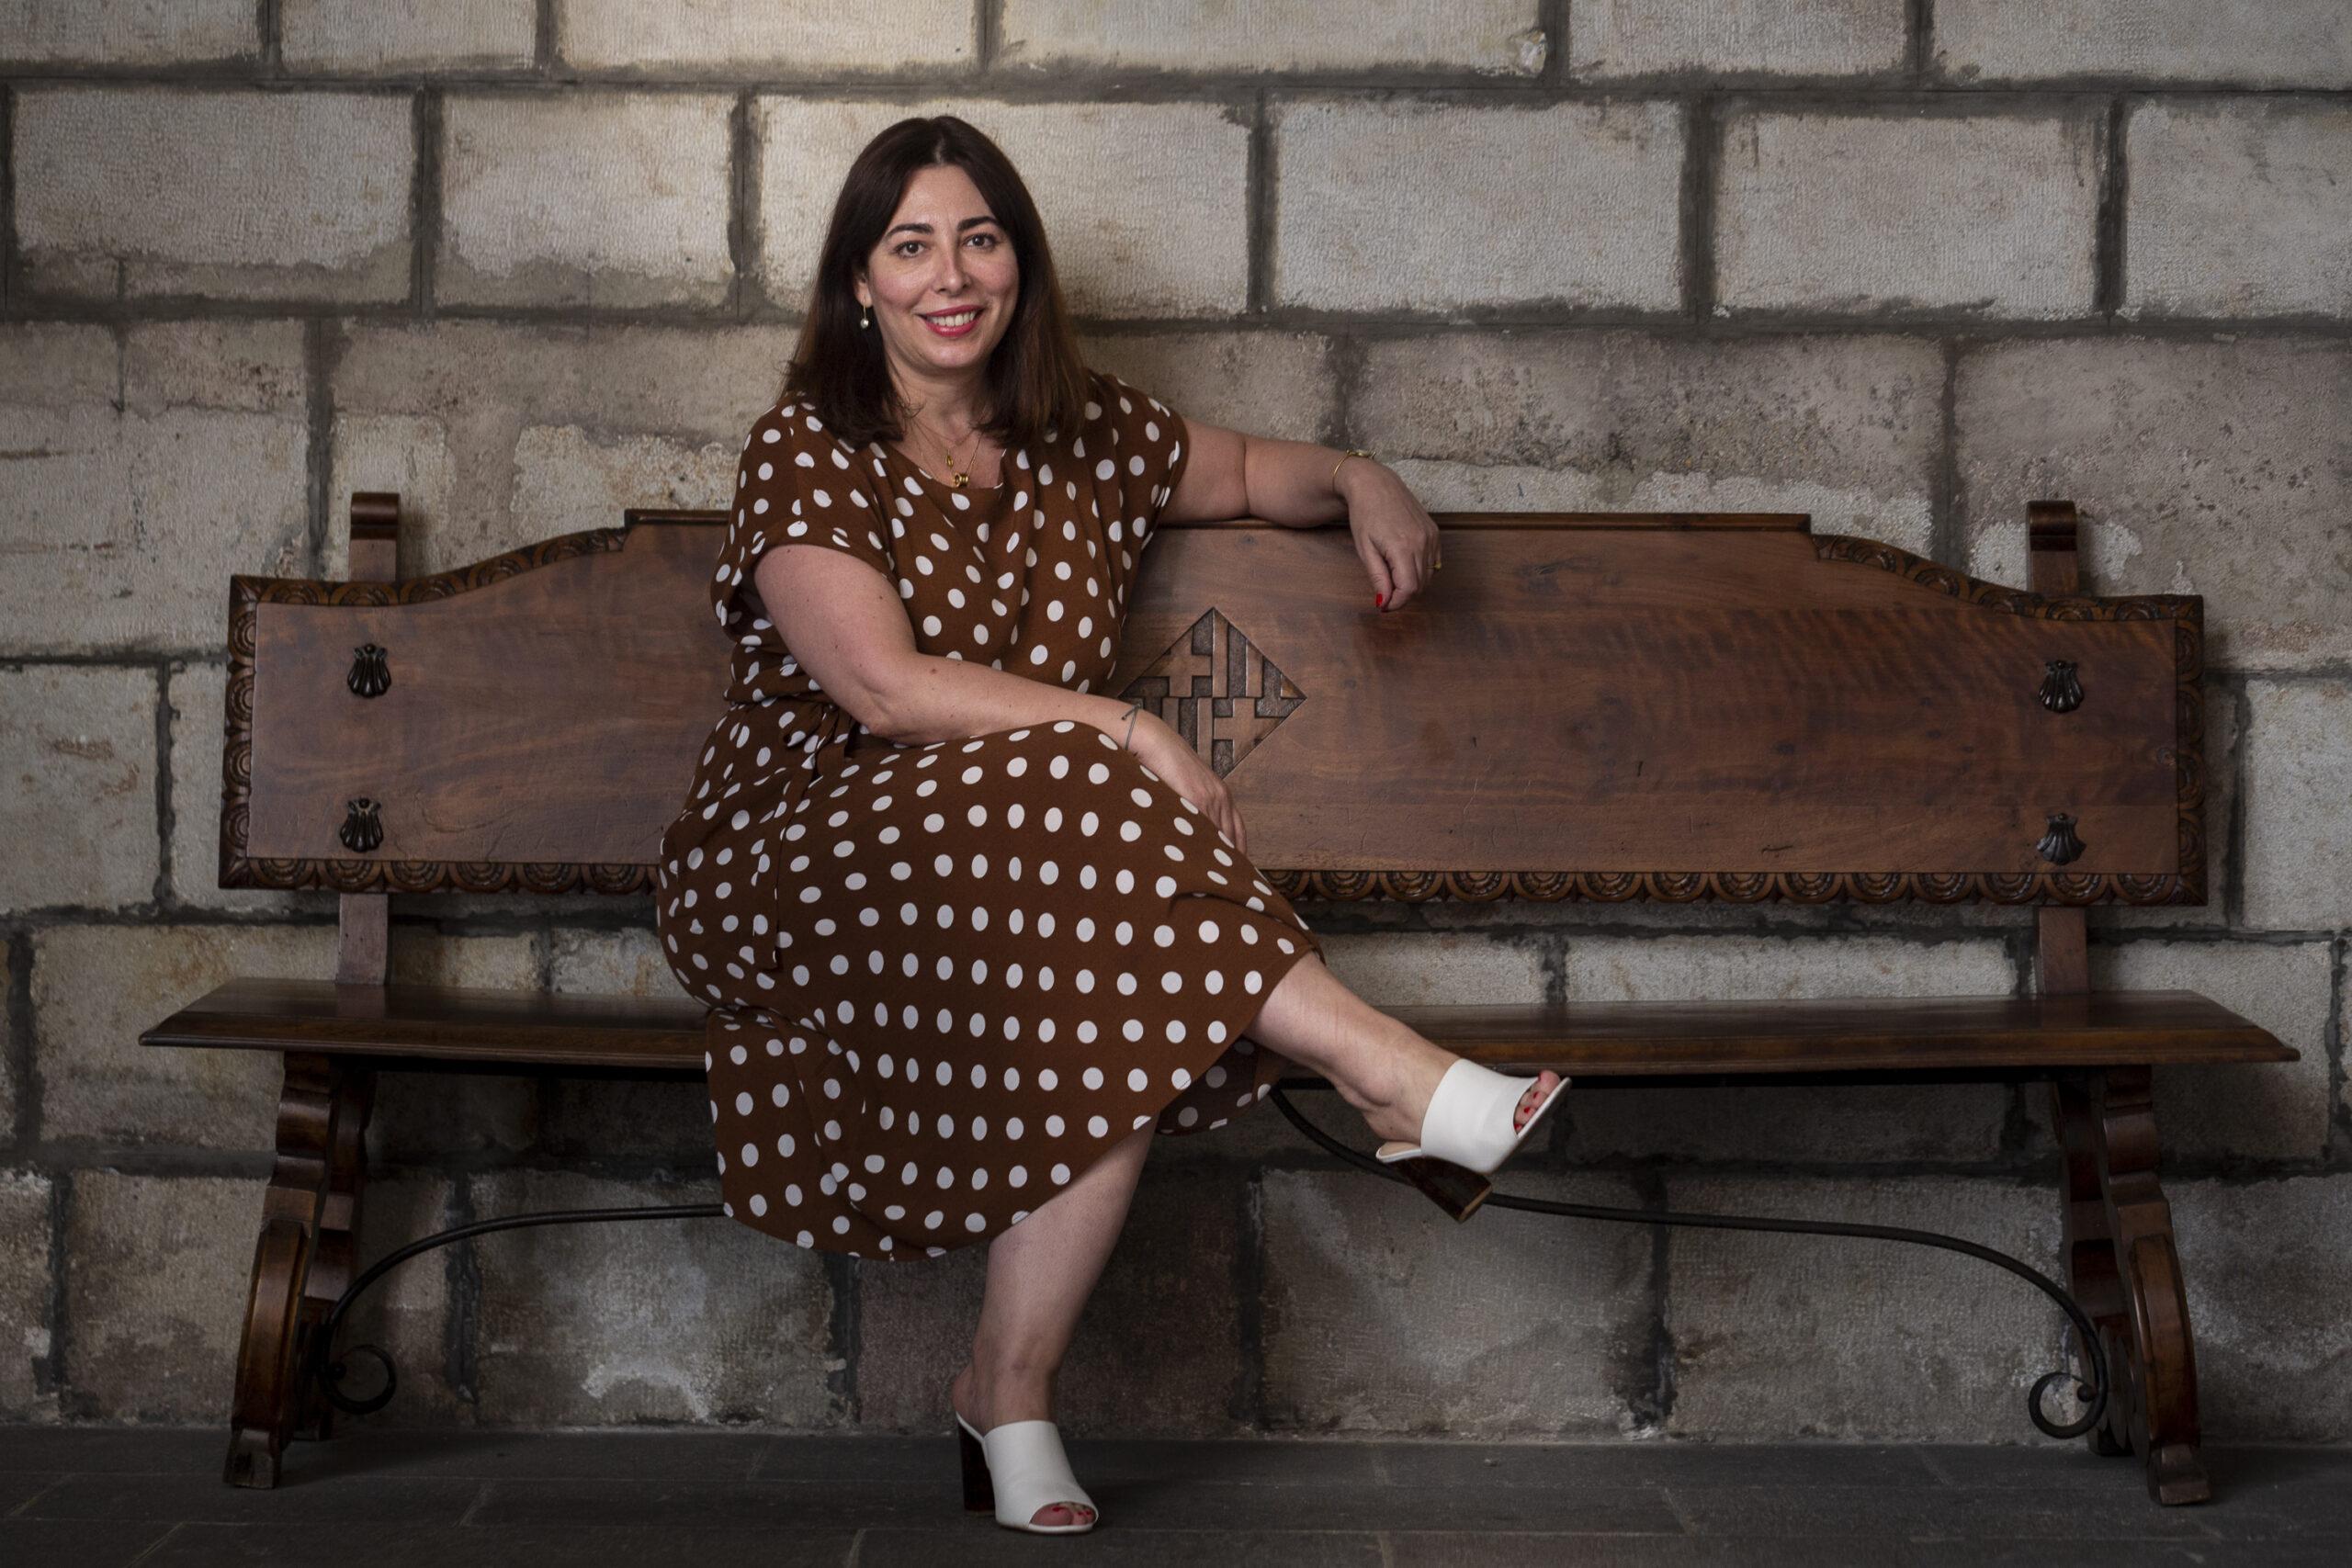 La presidenta del grup municipal de Ciutadans a Barcelona, Luz Guilarte / Mireia Comas